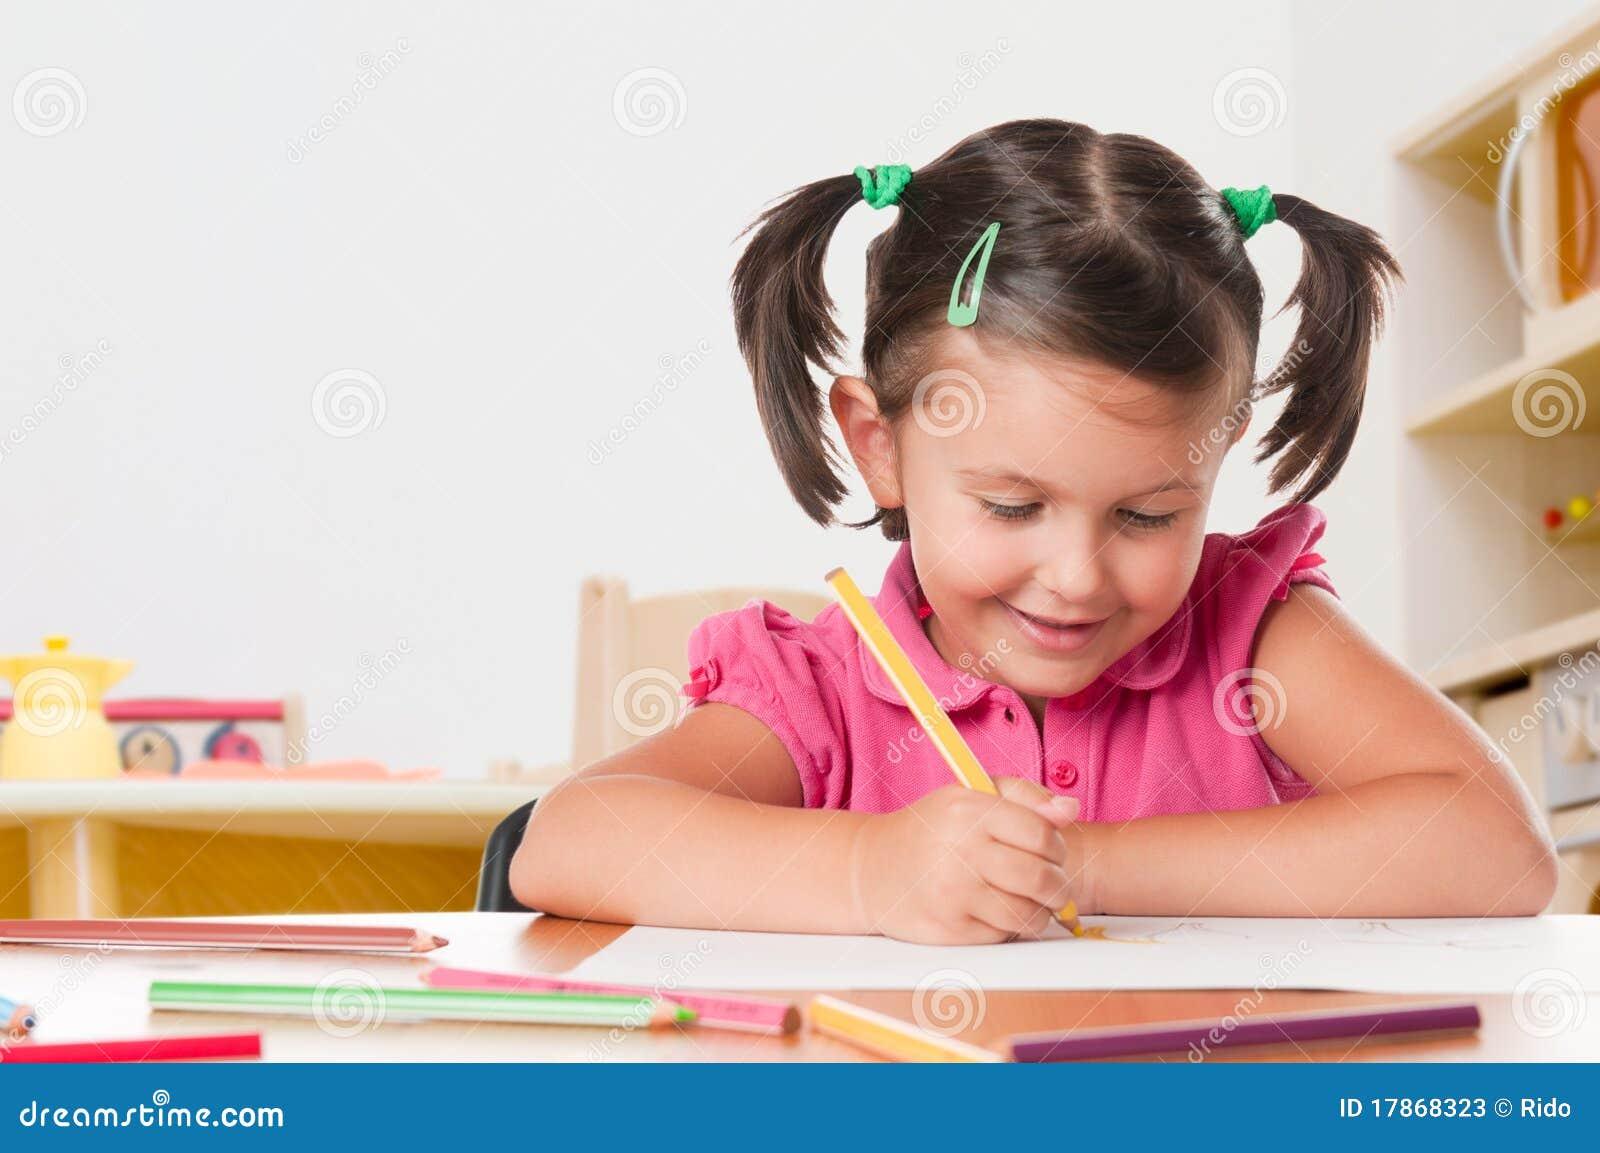 spanish childhood essay